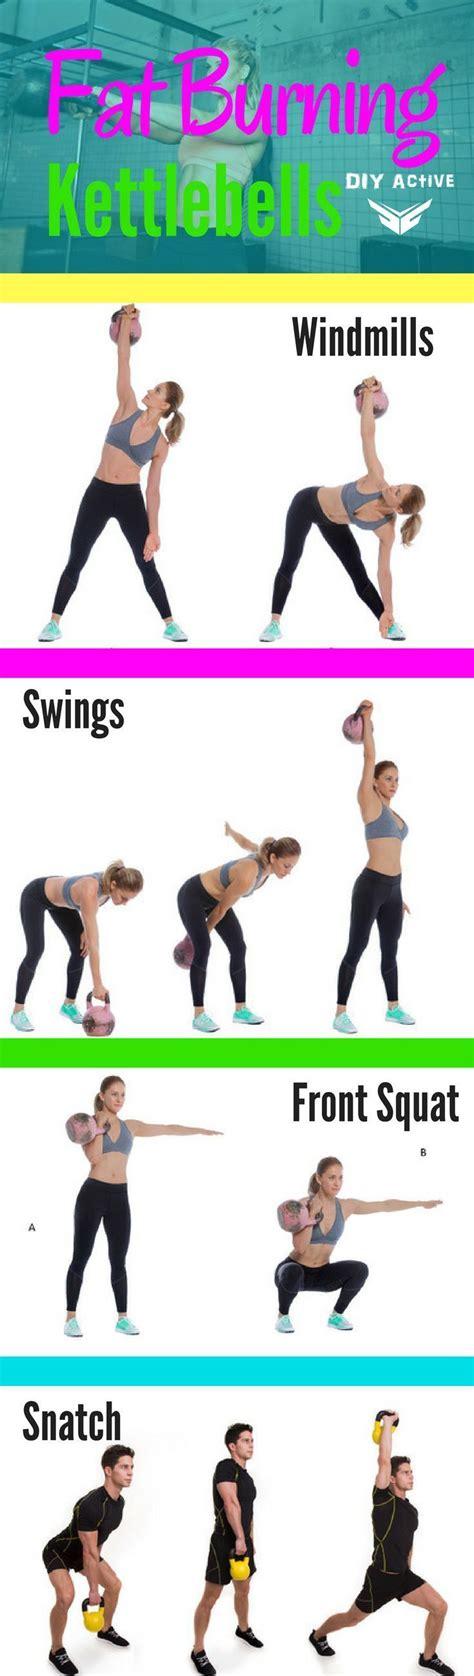 kettlebell workout diyactive improve strength